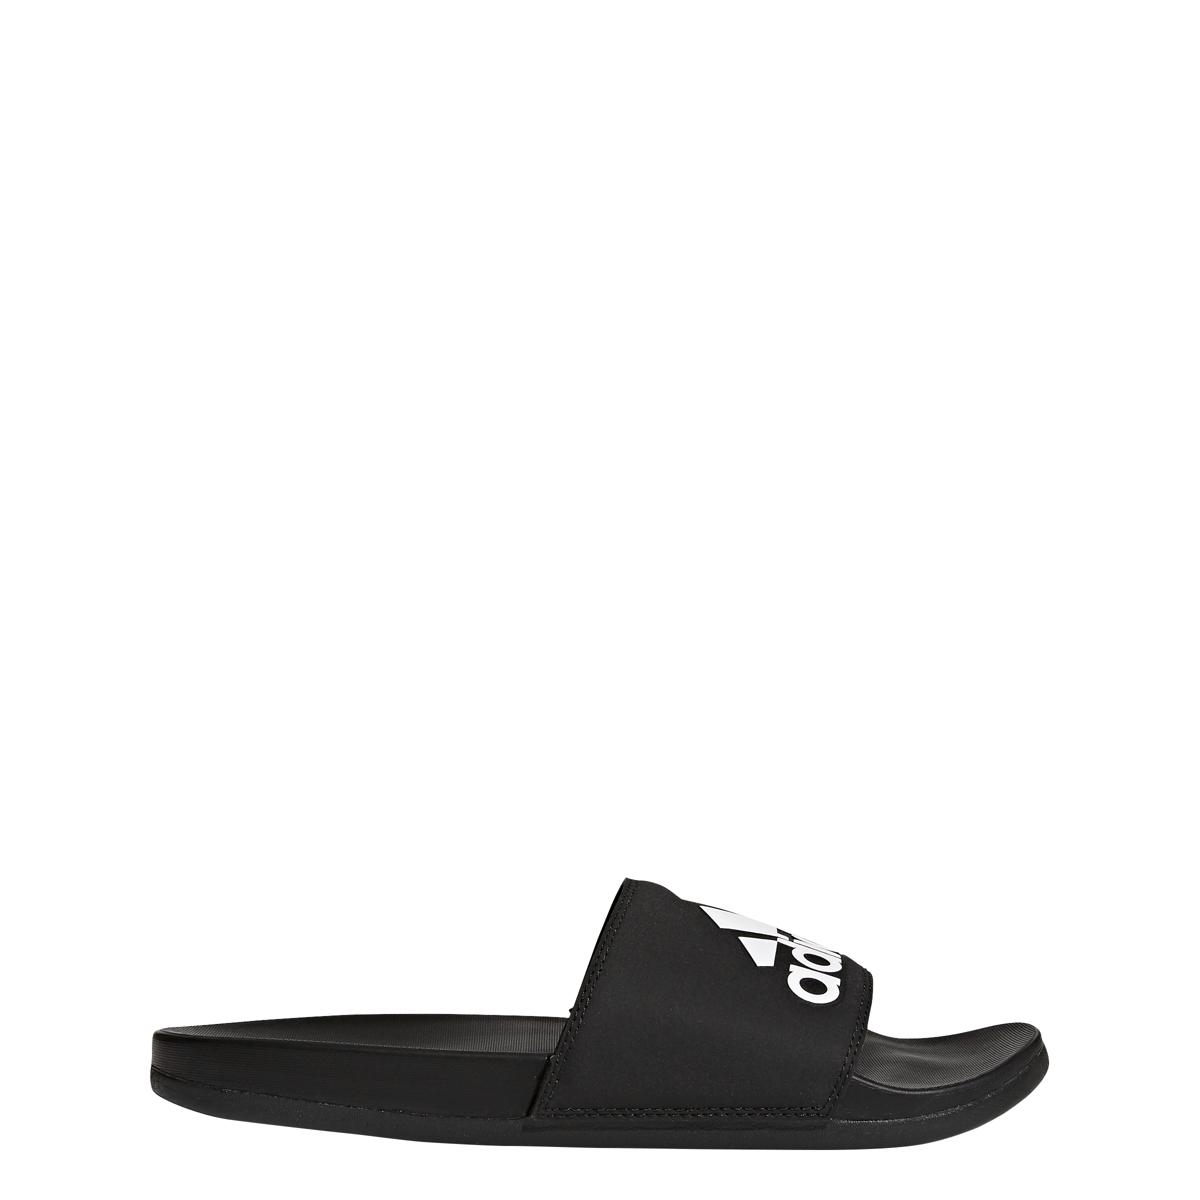 0b28f65b3122 Details about Men s Adidas Adilette Comfort Slide Sandal Black